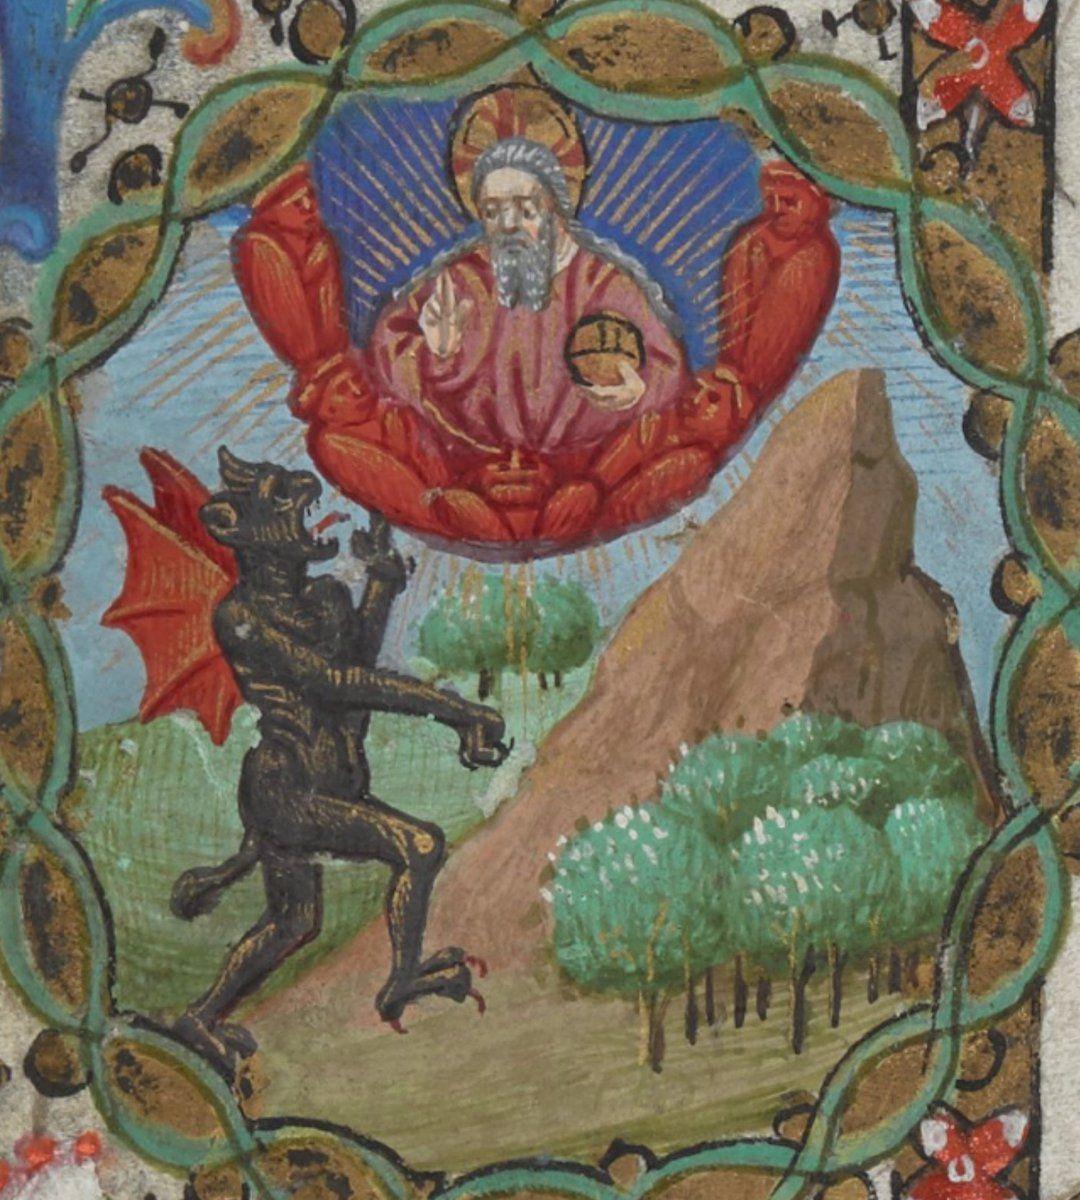 The Devil arguing with God BL, Egerton 2019, 15th c ...